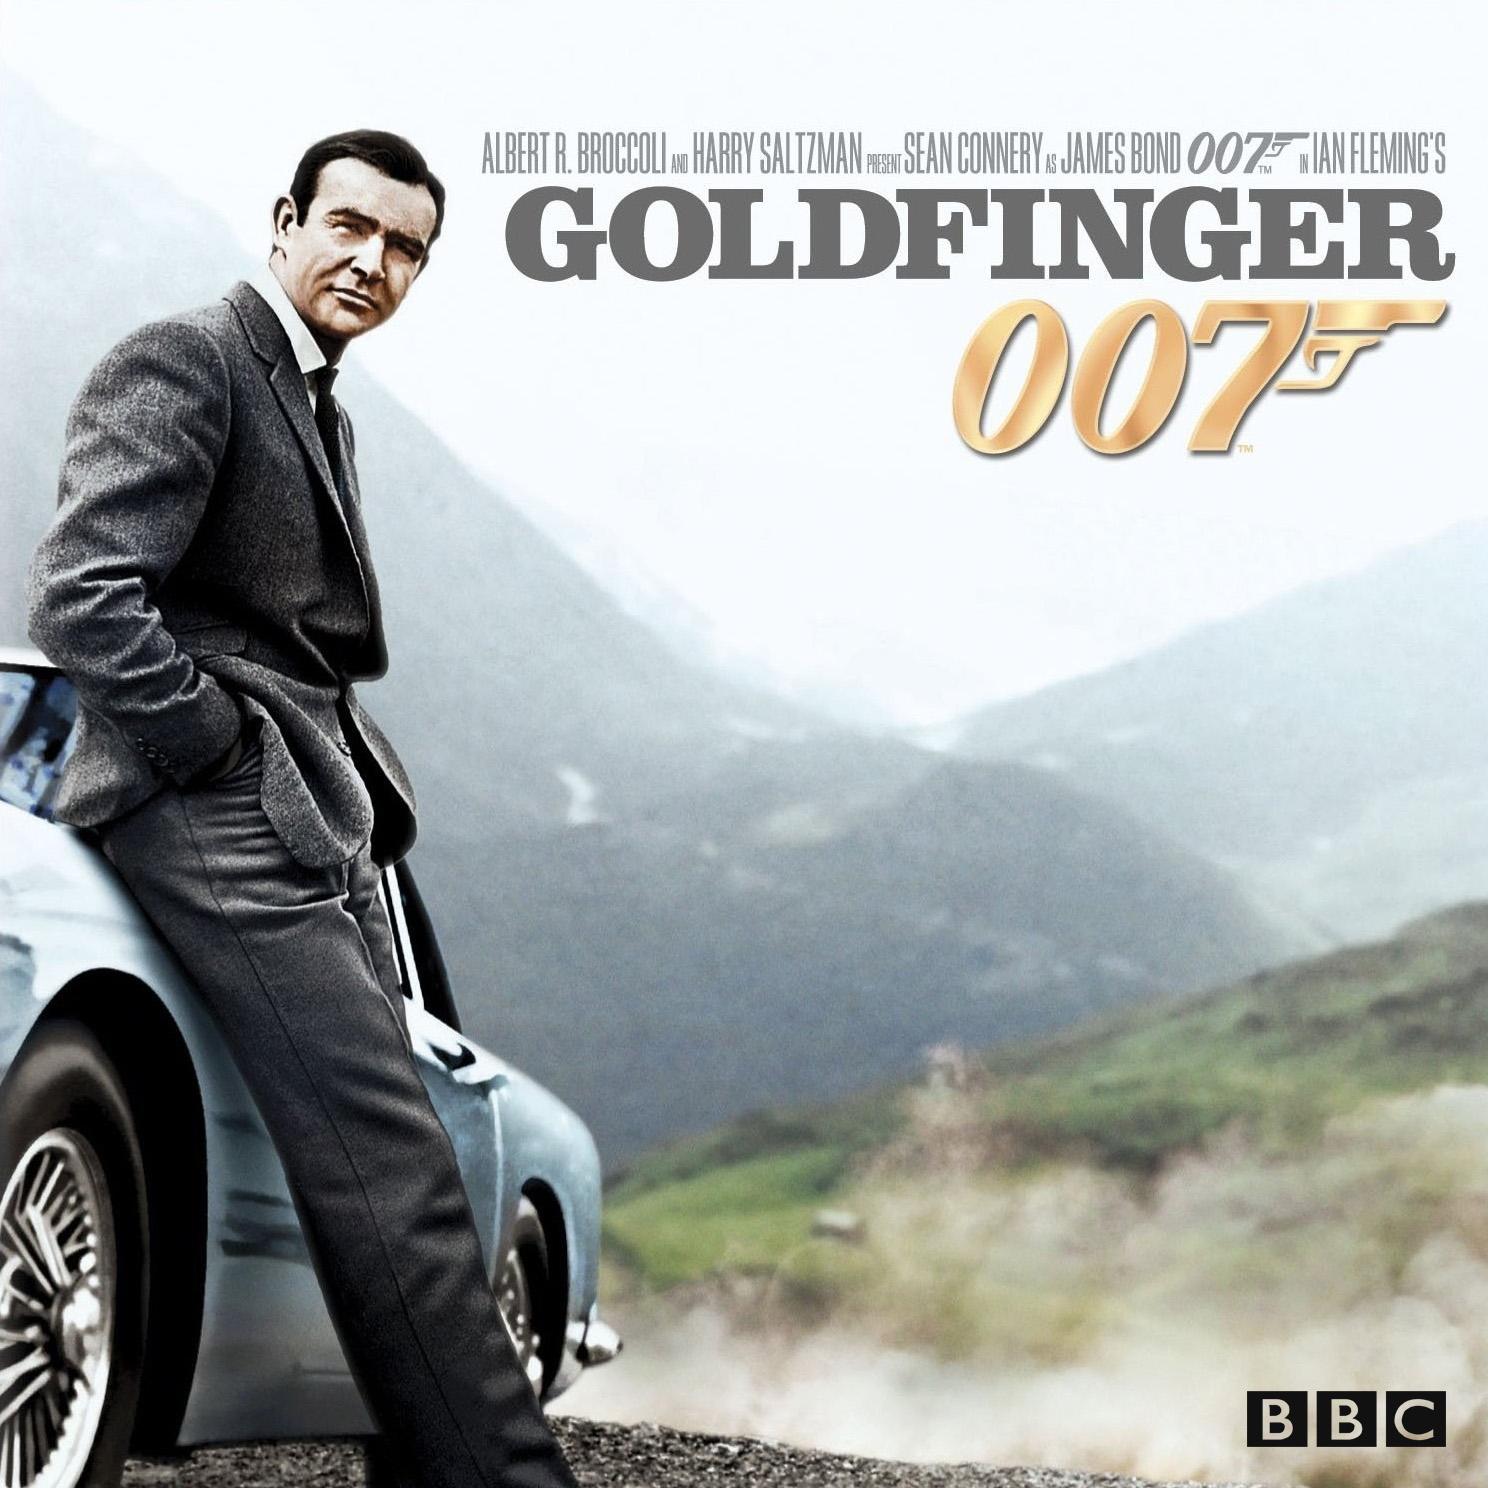 BBC - James Bond - Goldfinger - Ian Fleming